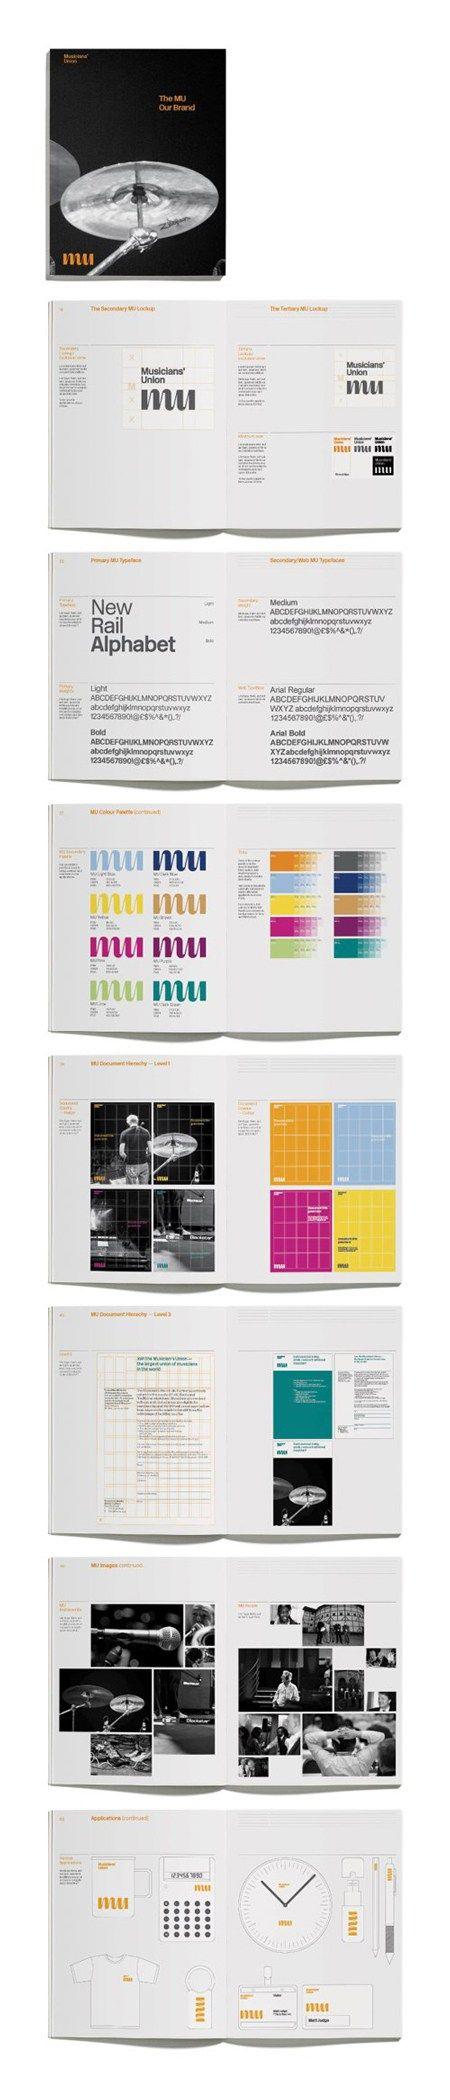 Musicians' Union logo Brand guidelines, Brand book